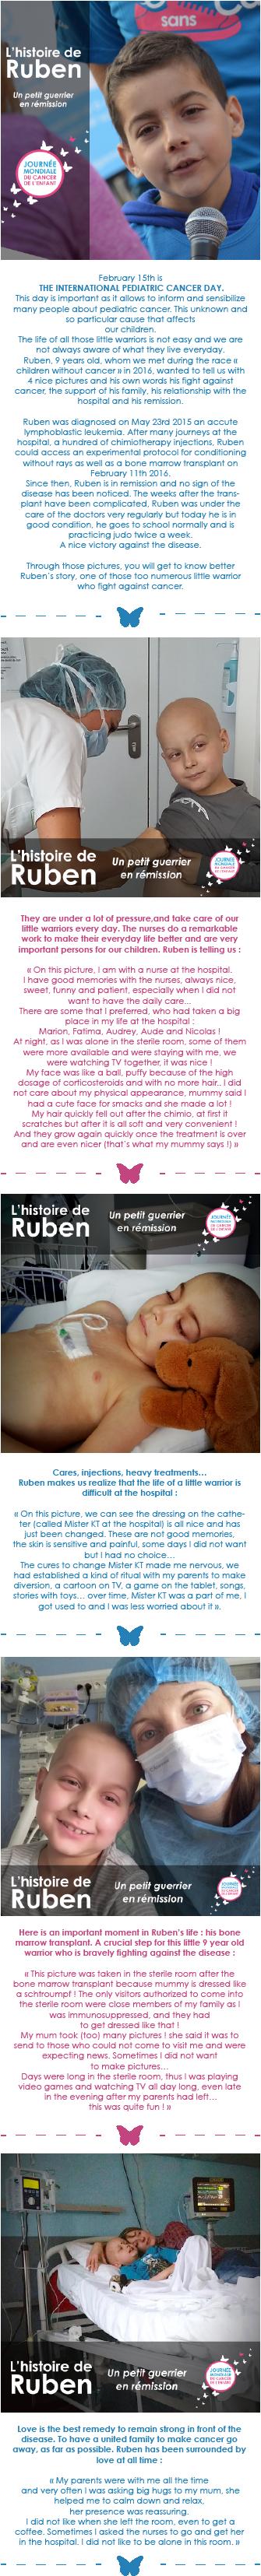 story Ruben